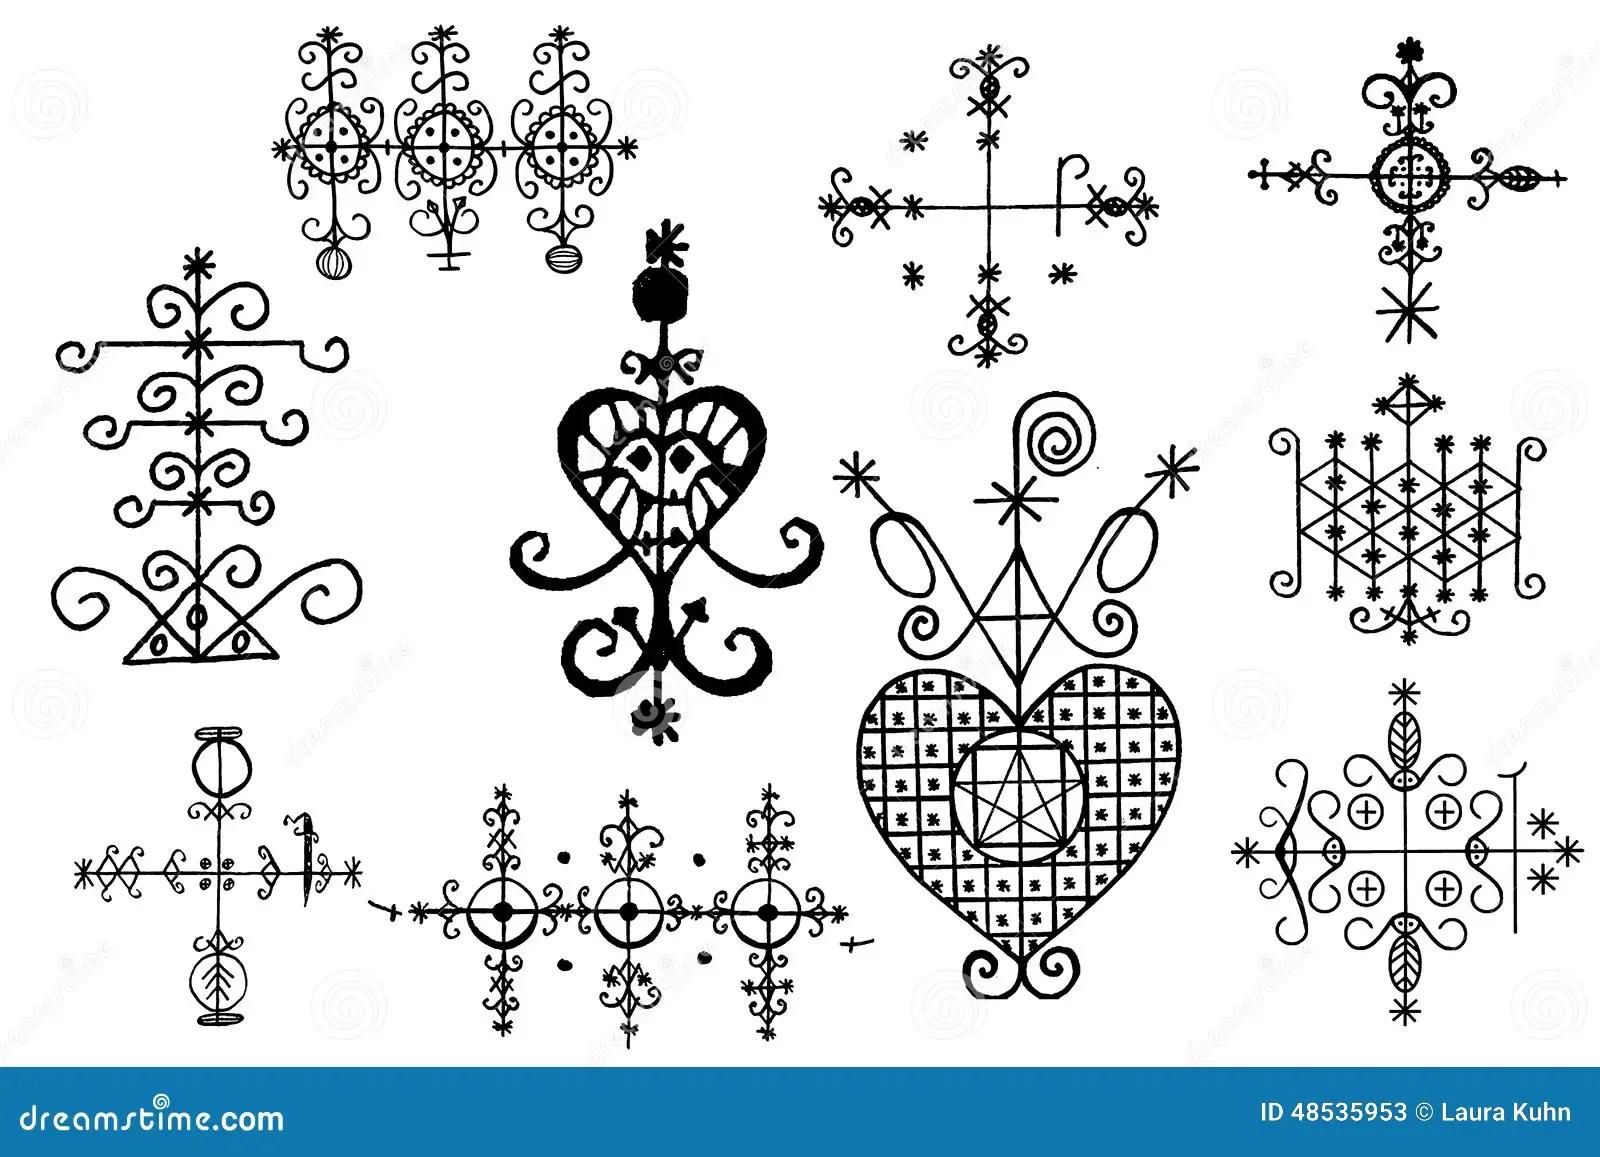 Voodoo Spirit Symbols Stock Image Image Of Landmark